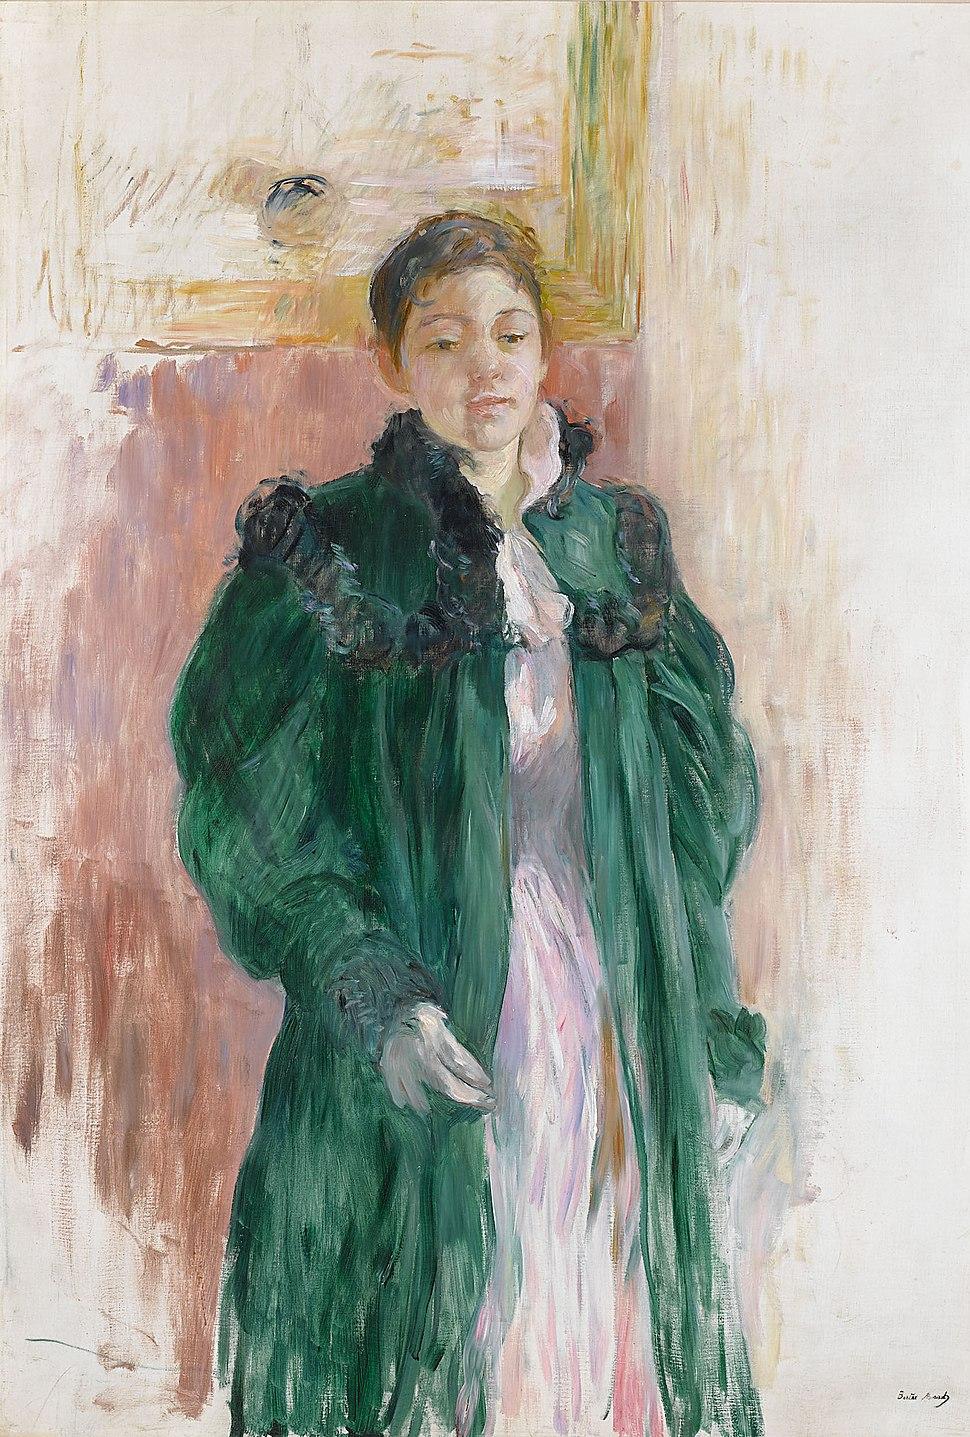 Jeune Fille au Manteau Vert by Berthe Morisot